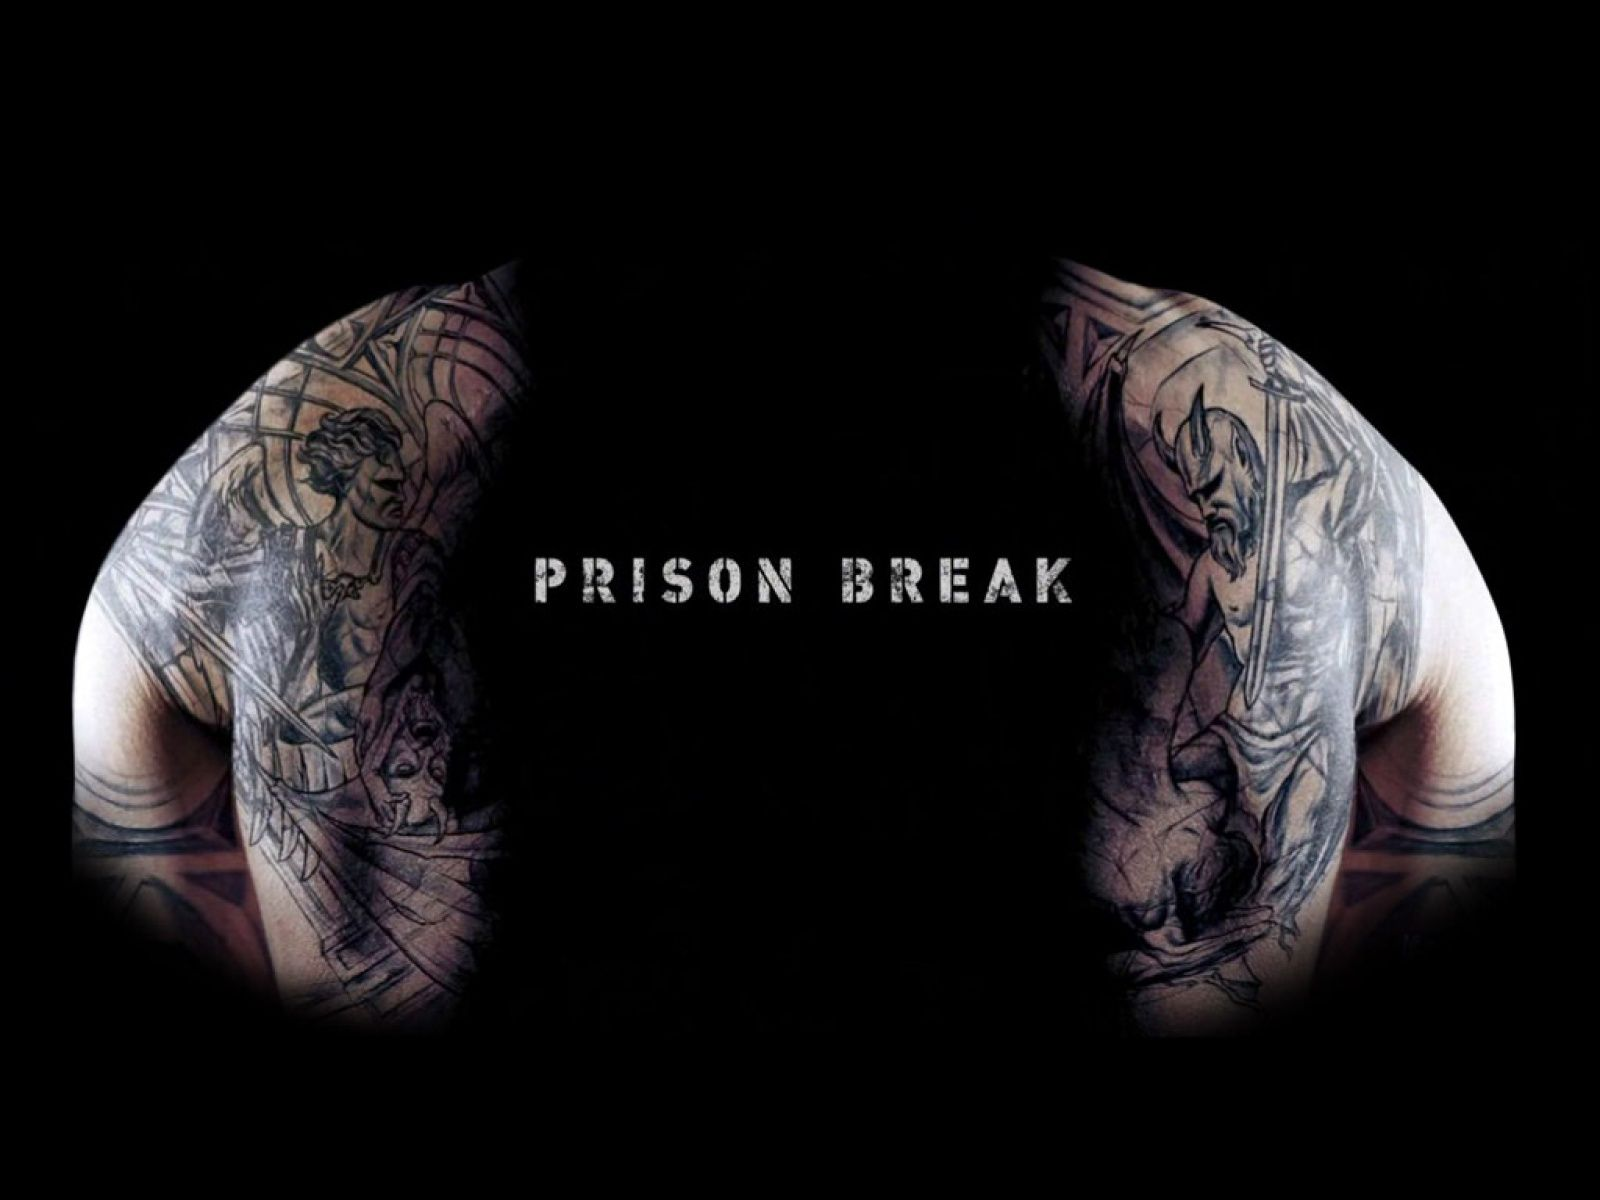 prison-break wallpapers | tv series | pinterest | prison break and tvs